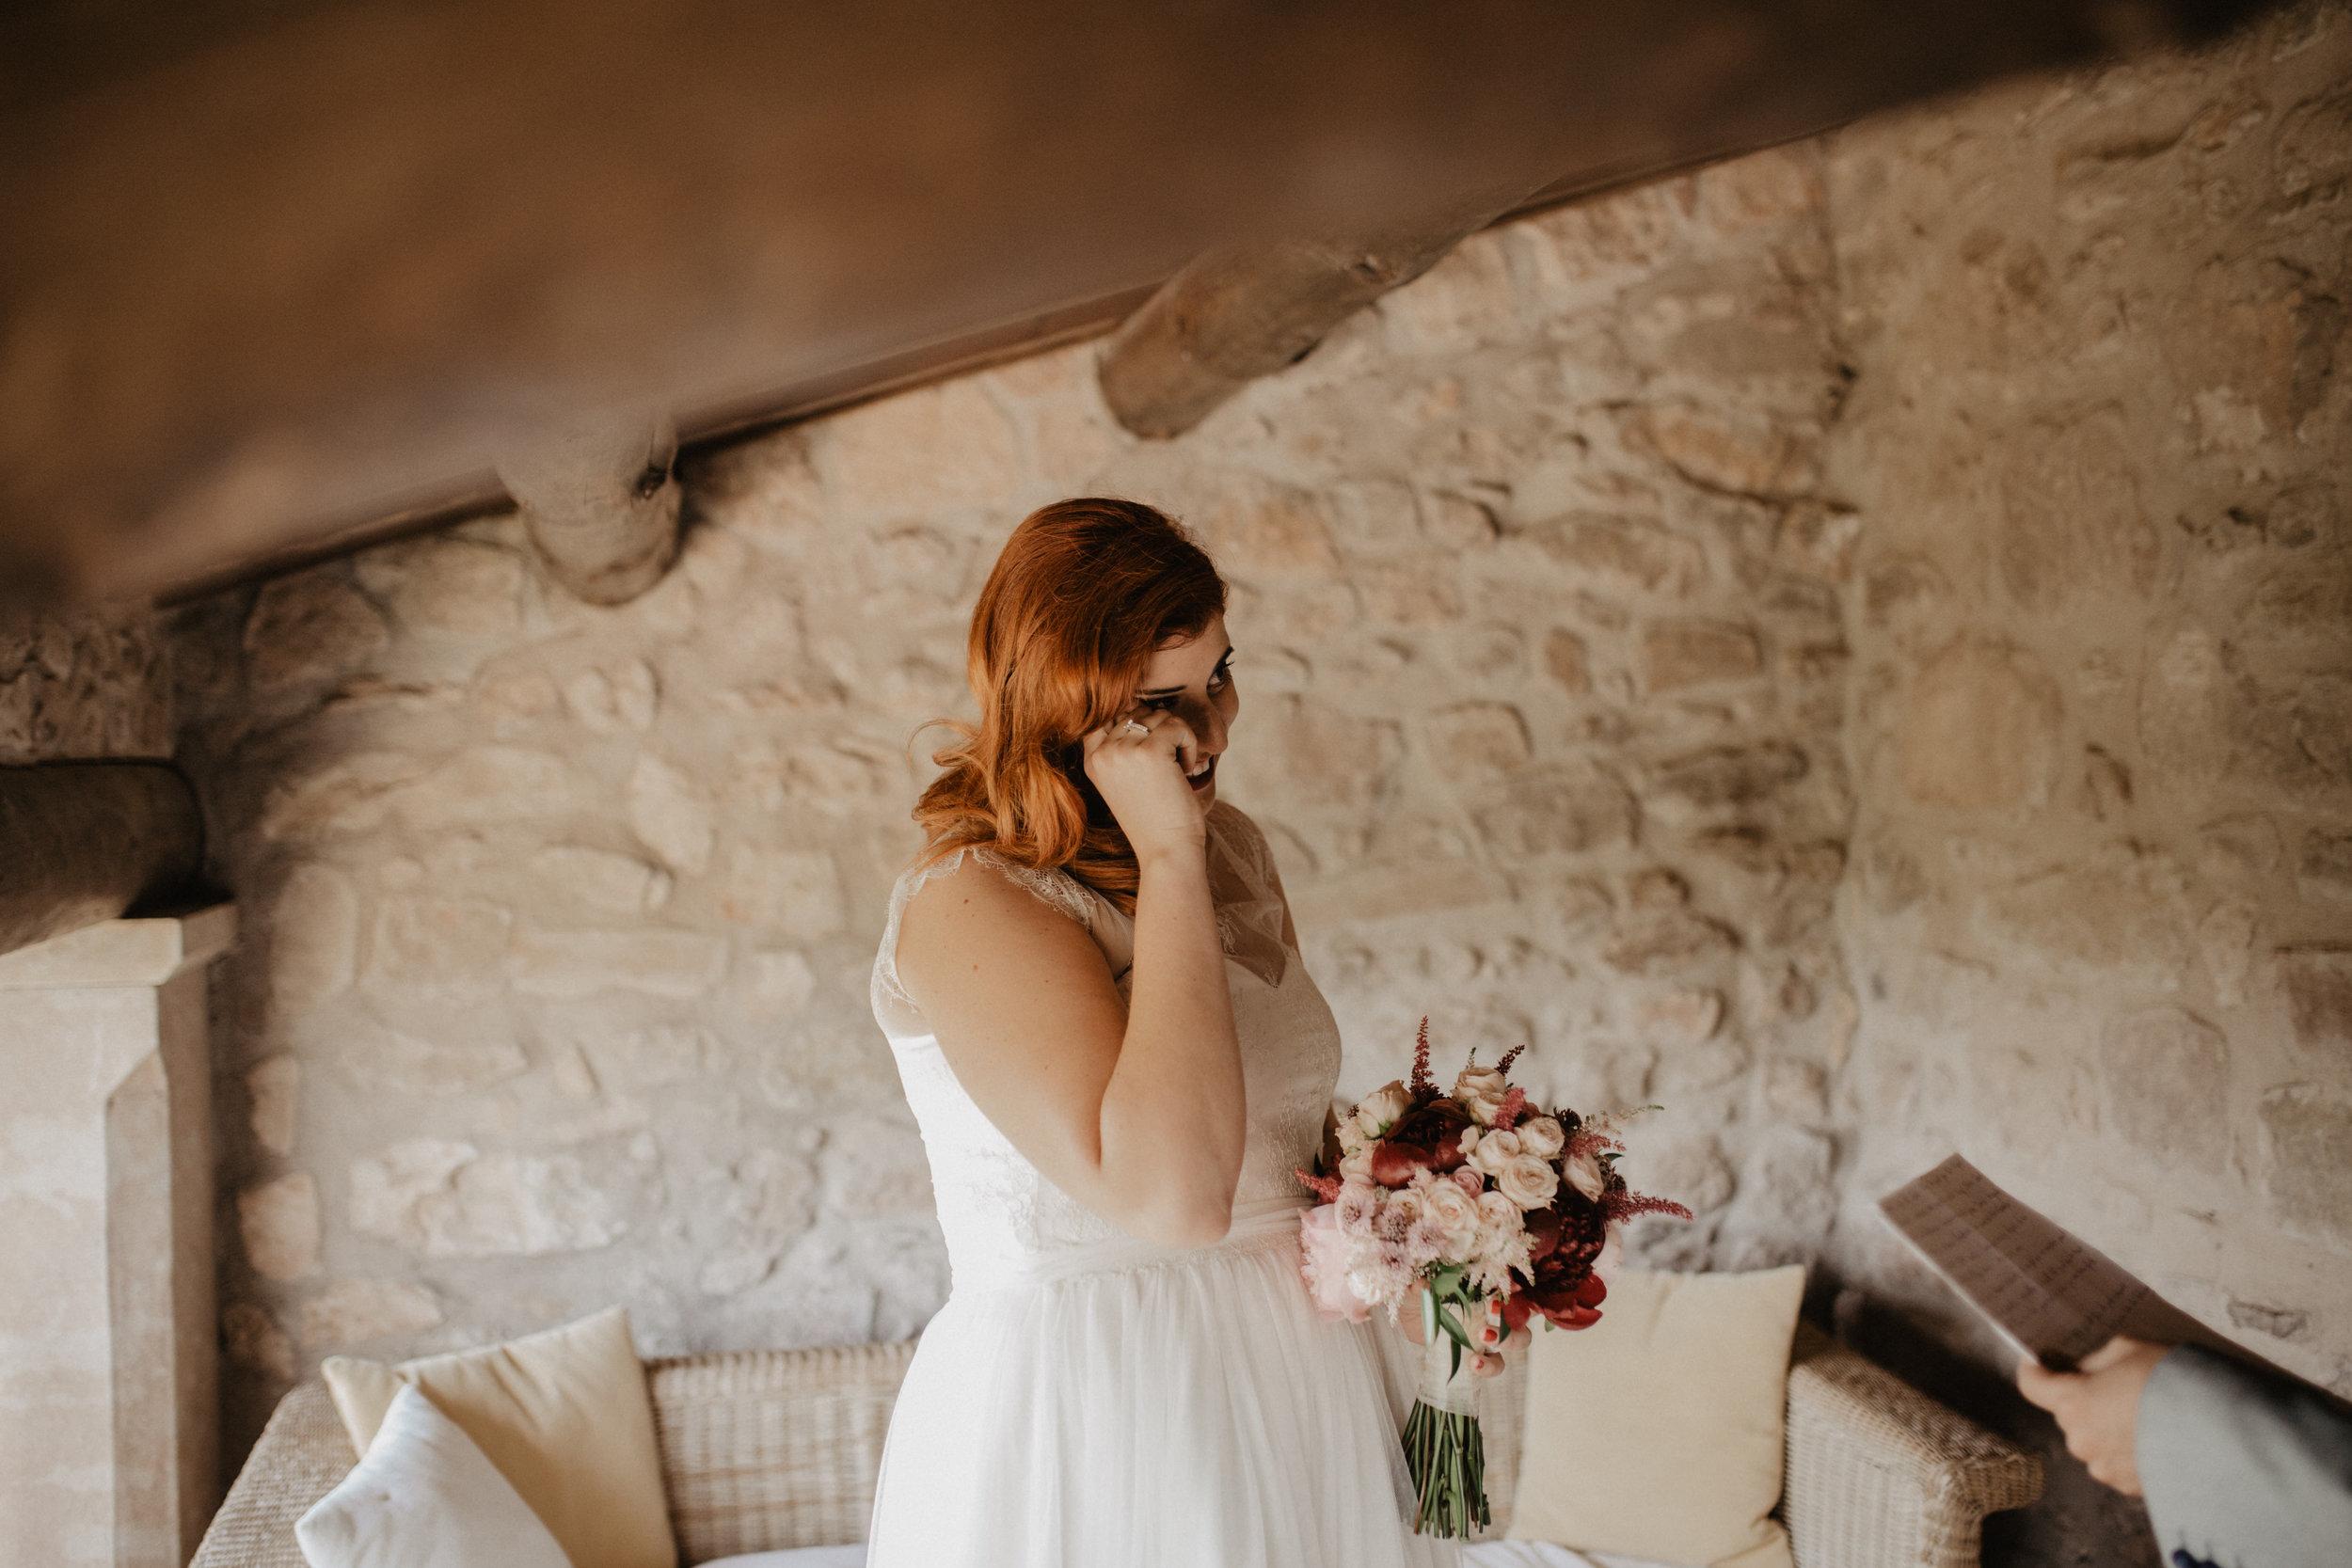 thenortherngirlphotography_photography_thenortherngirl_rebeccascabros_wedding_weddingphotography_masialagarrigadecastelladral_joaniemma_bodaenbarcelona_weddingphotographer_emmaijoan-151.jpg